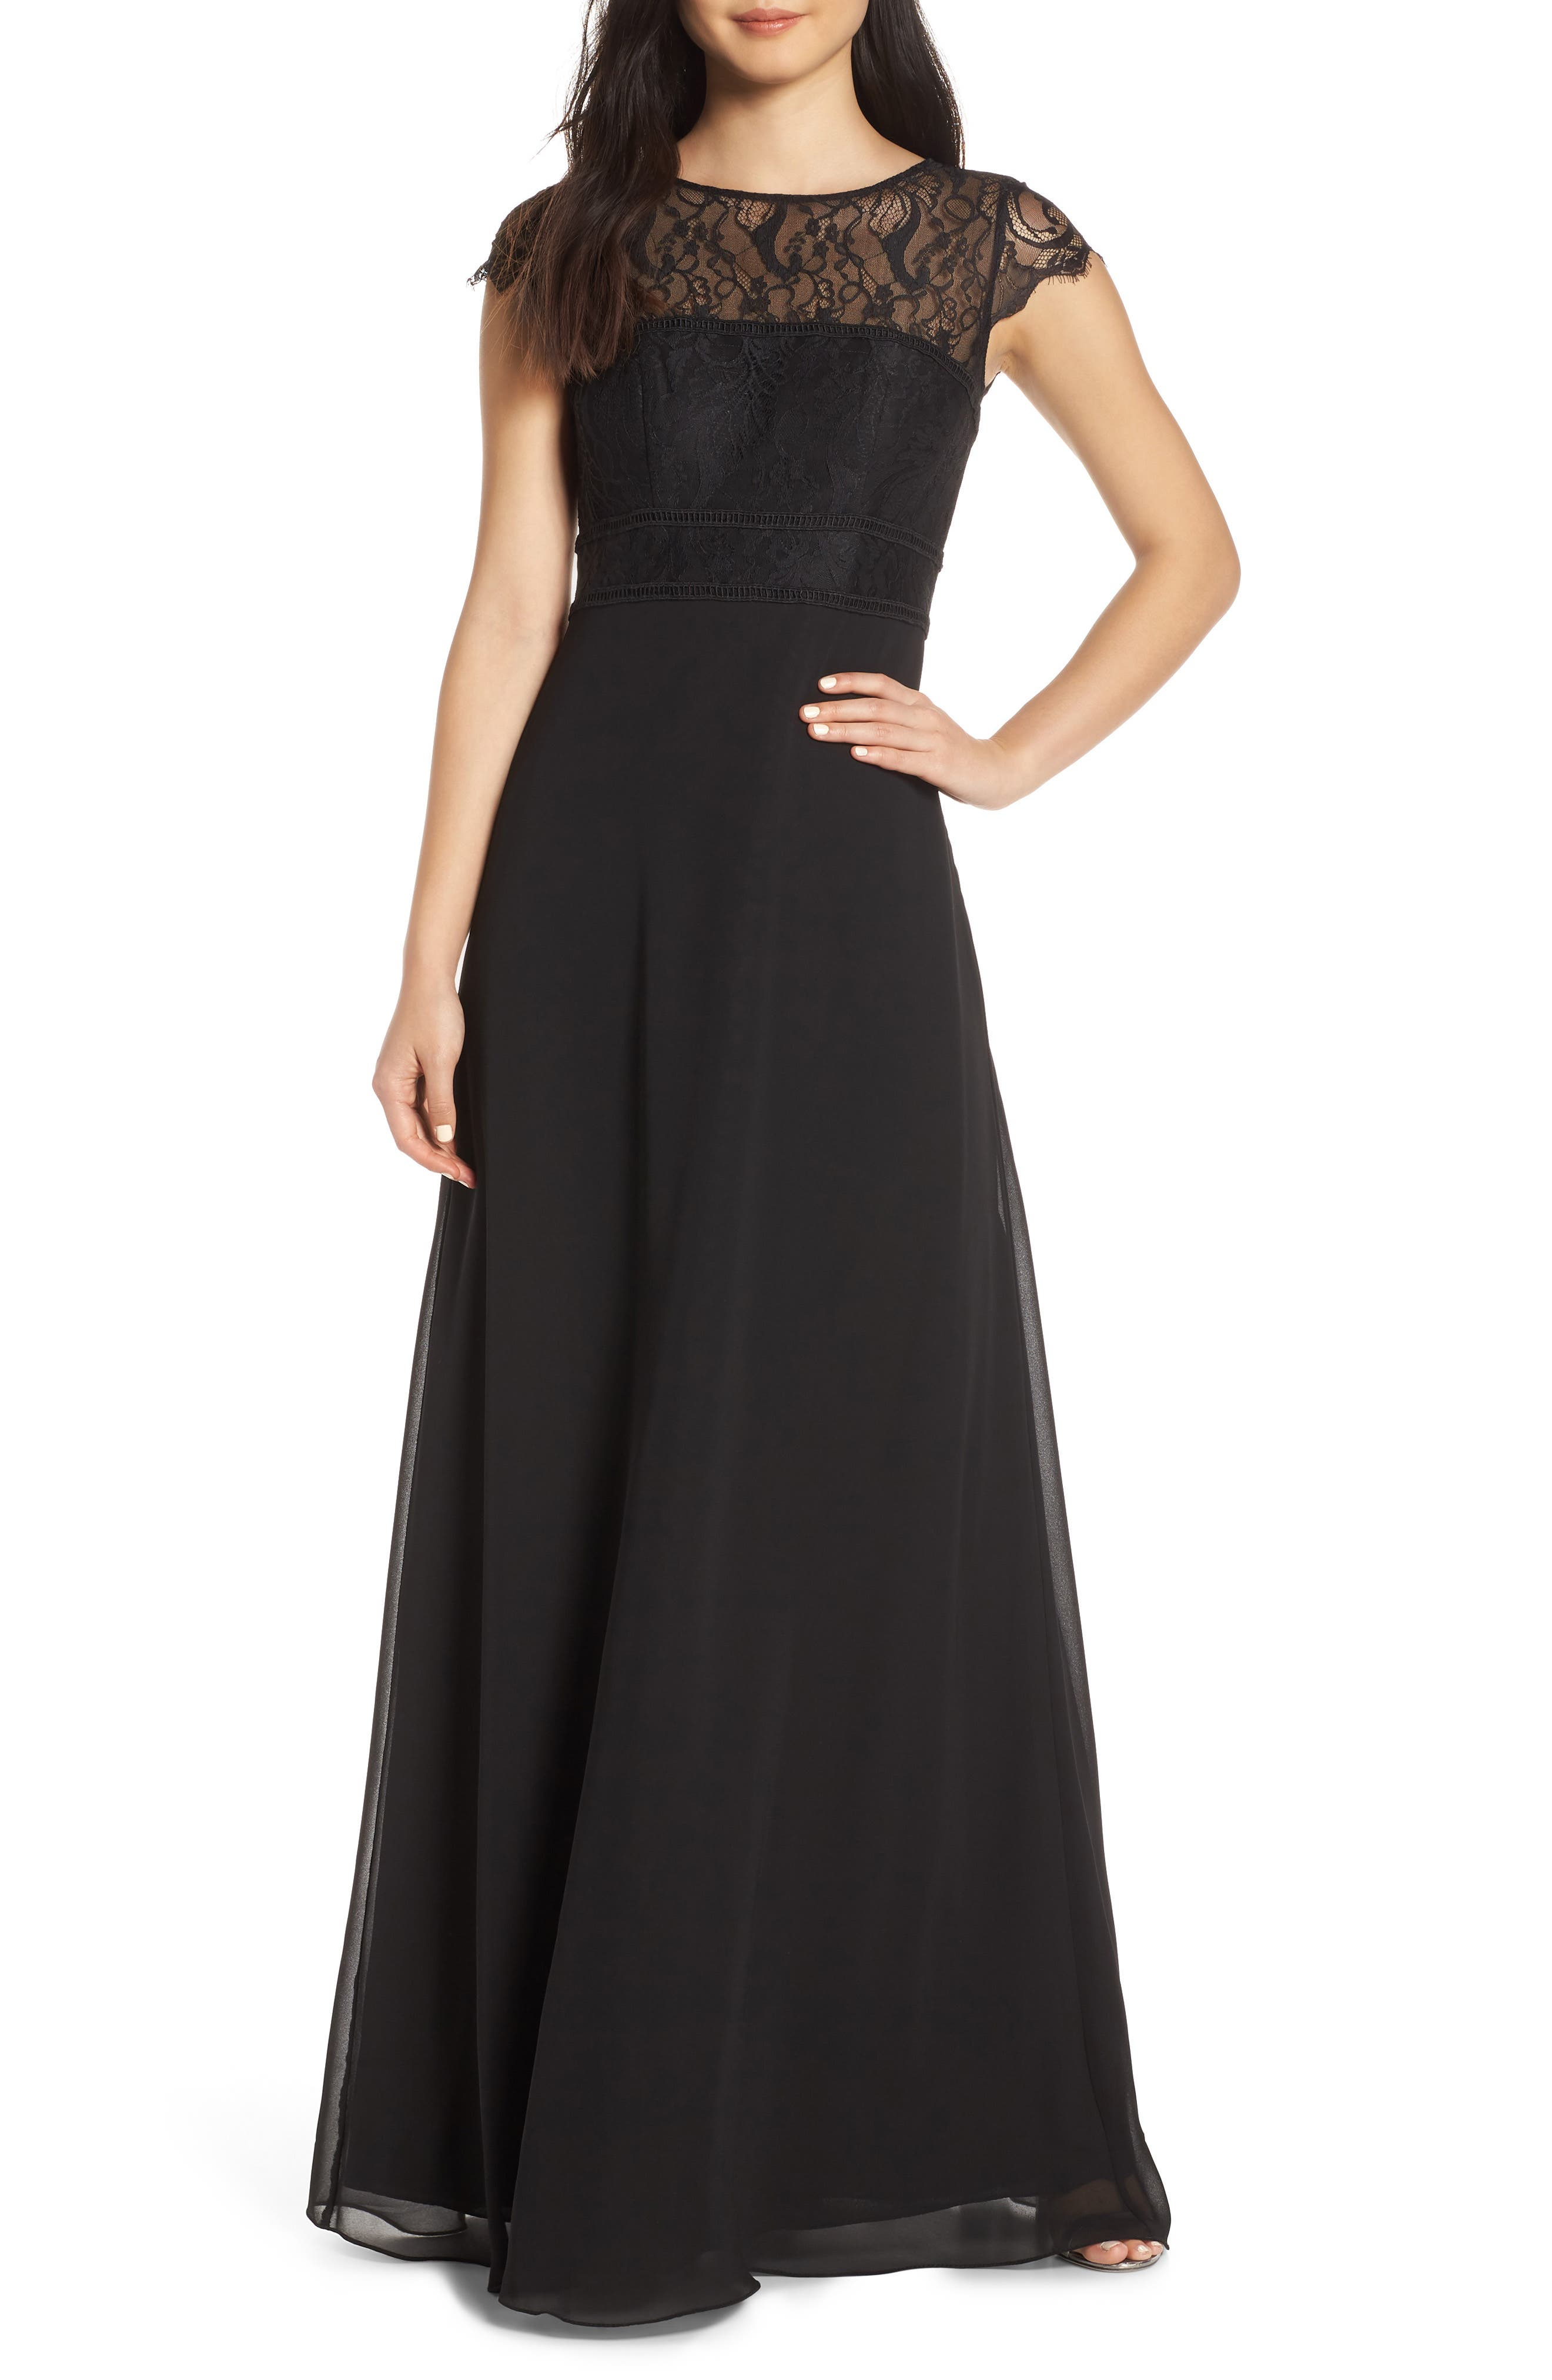 HAYLEY PAIGE OCCASIONS,                             Lace Bodice Chiffon Evening Dress,                             Main thumbnail 1, color,                             BLACK / BLACK